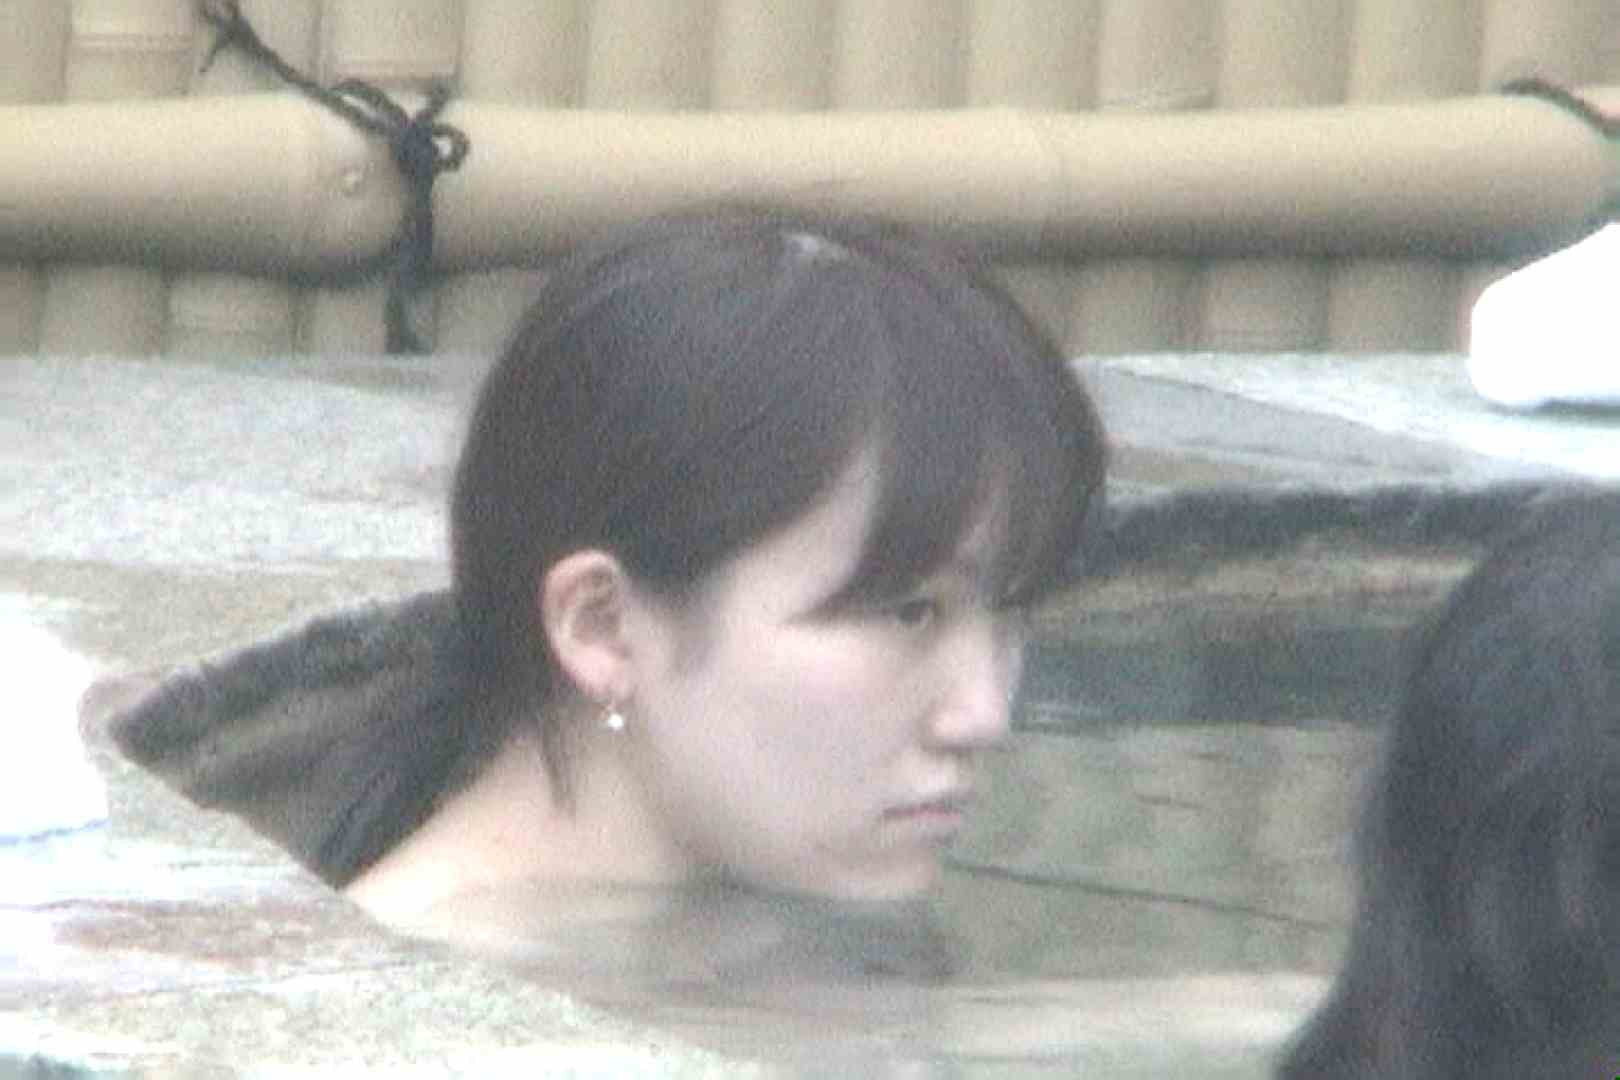 Aquaな露天風呂Vol.79【VIP限定】 盗撮 | HなOL  100pic 43